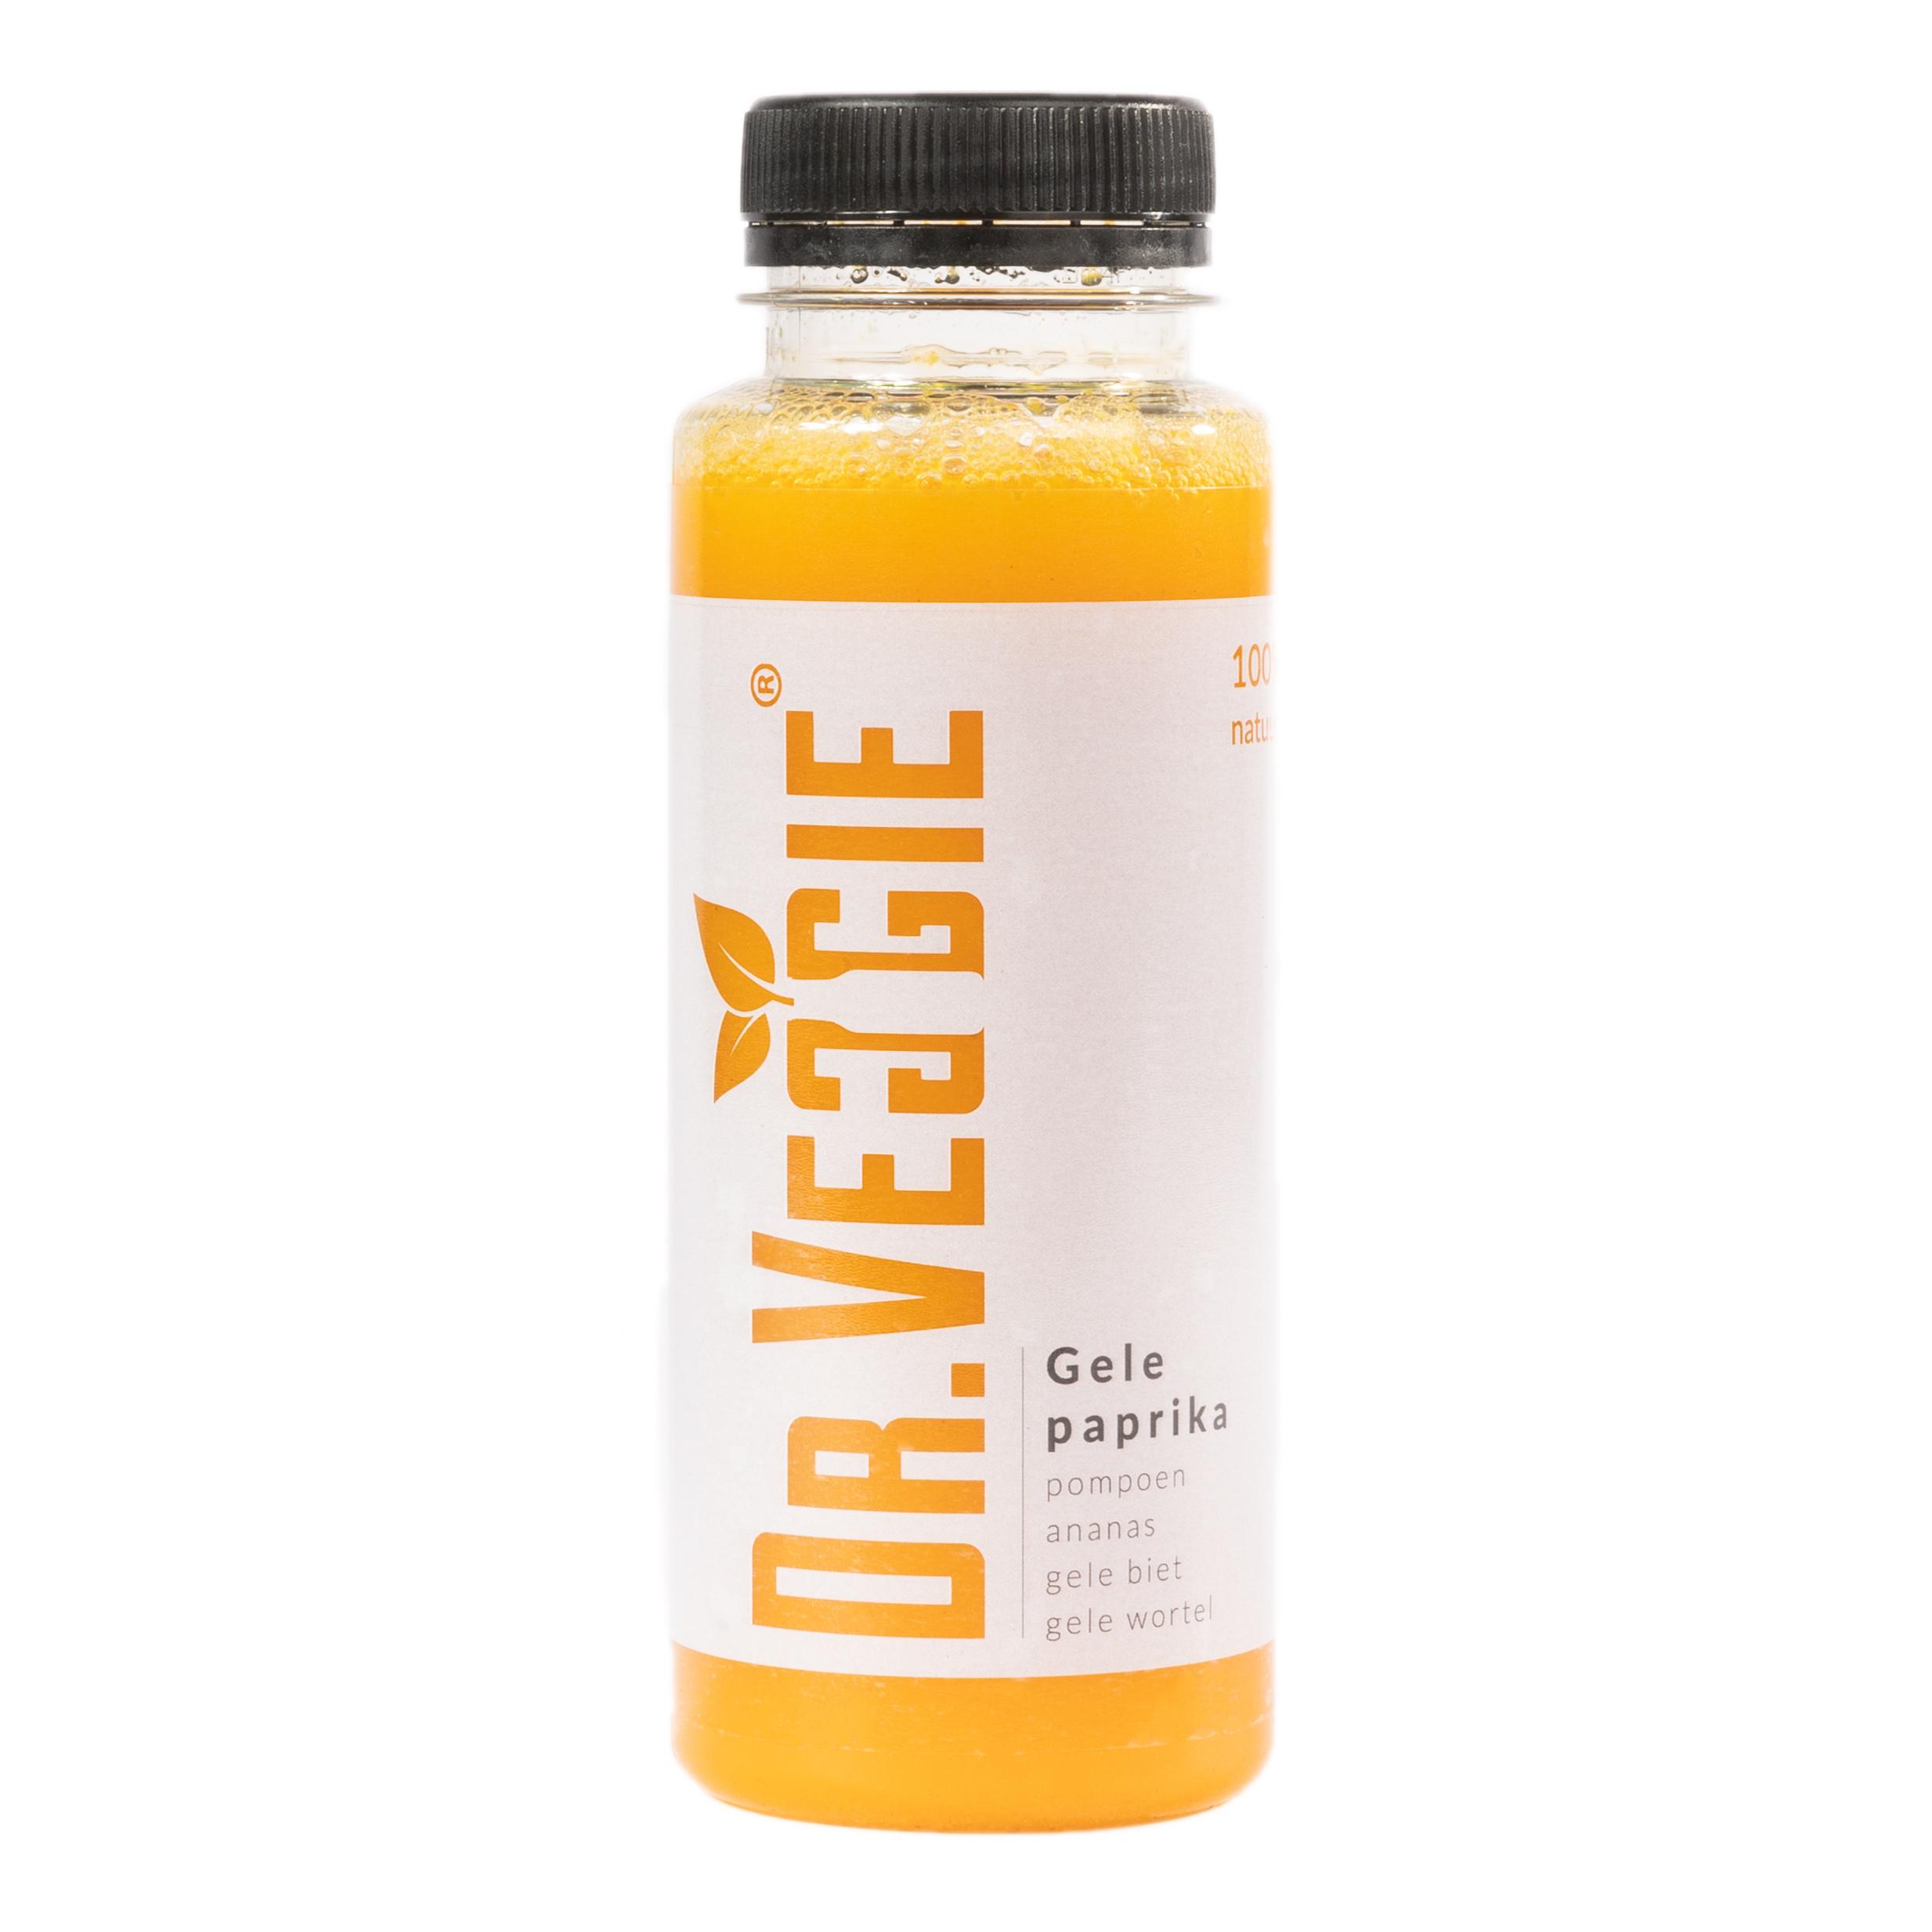 Groentesap Gele paprika ingredient Dr Veggie